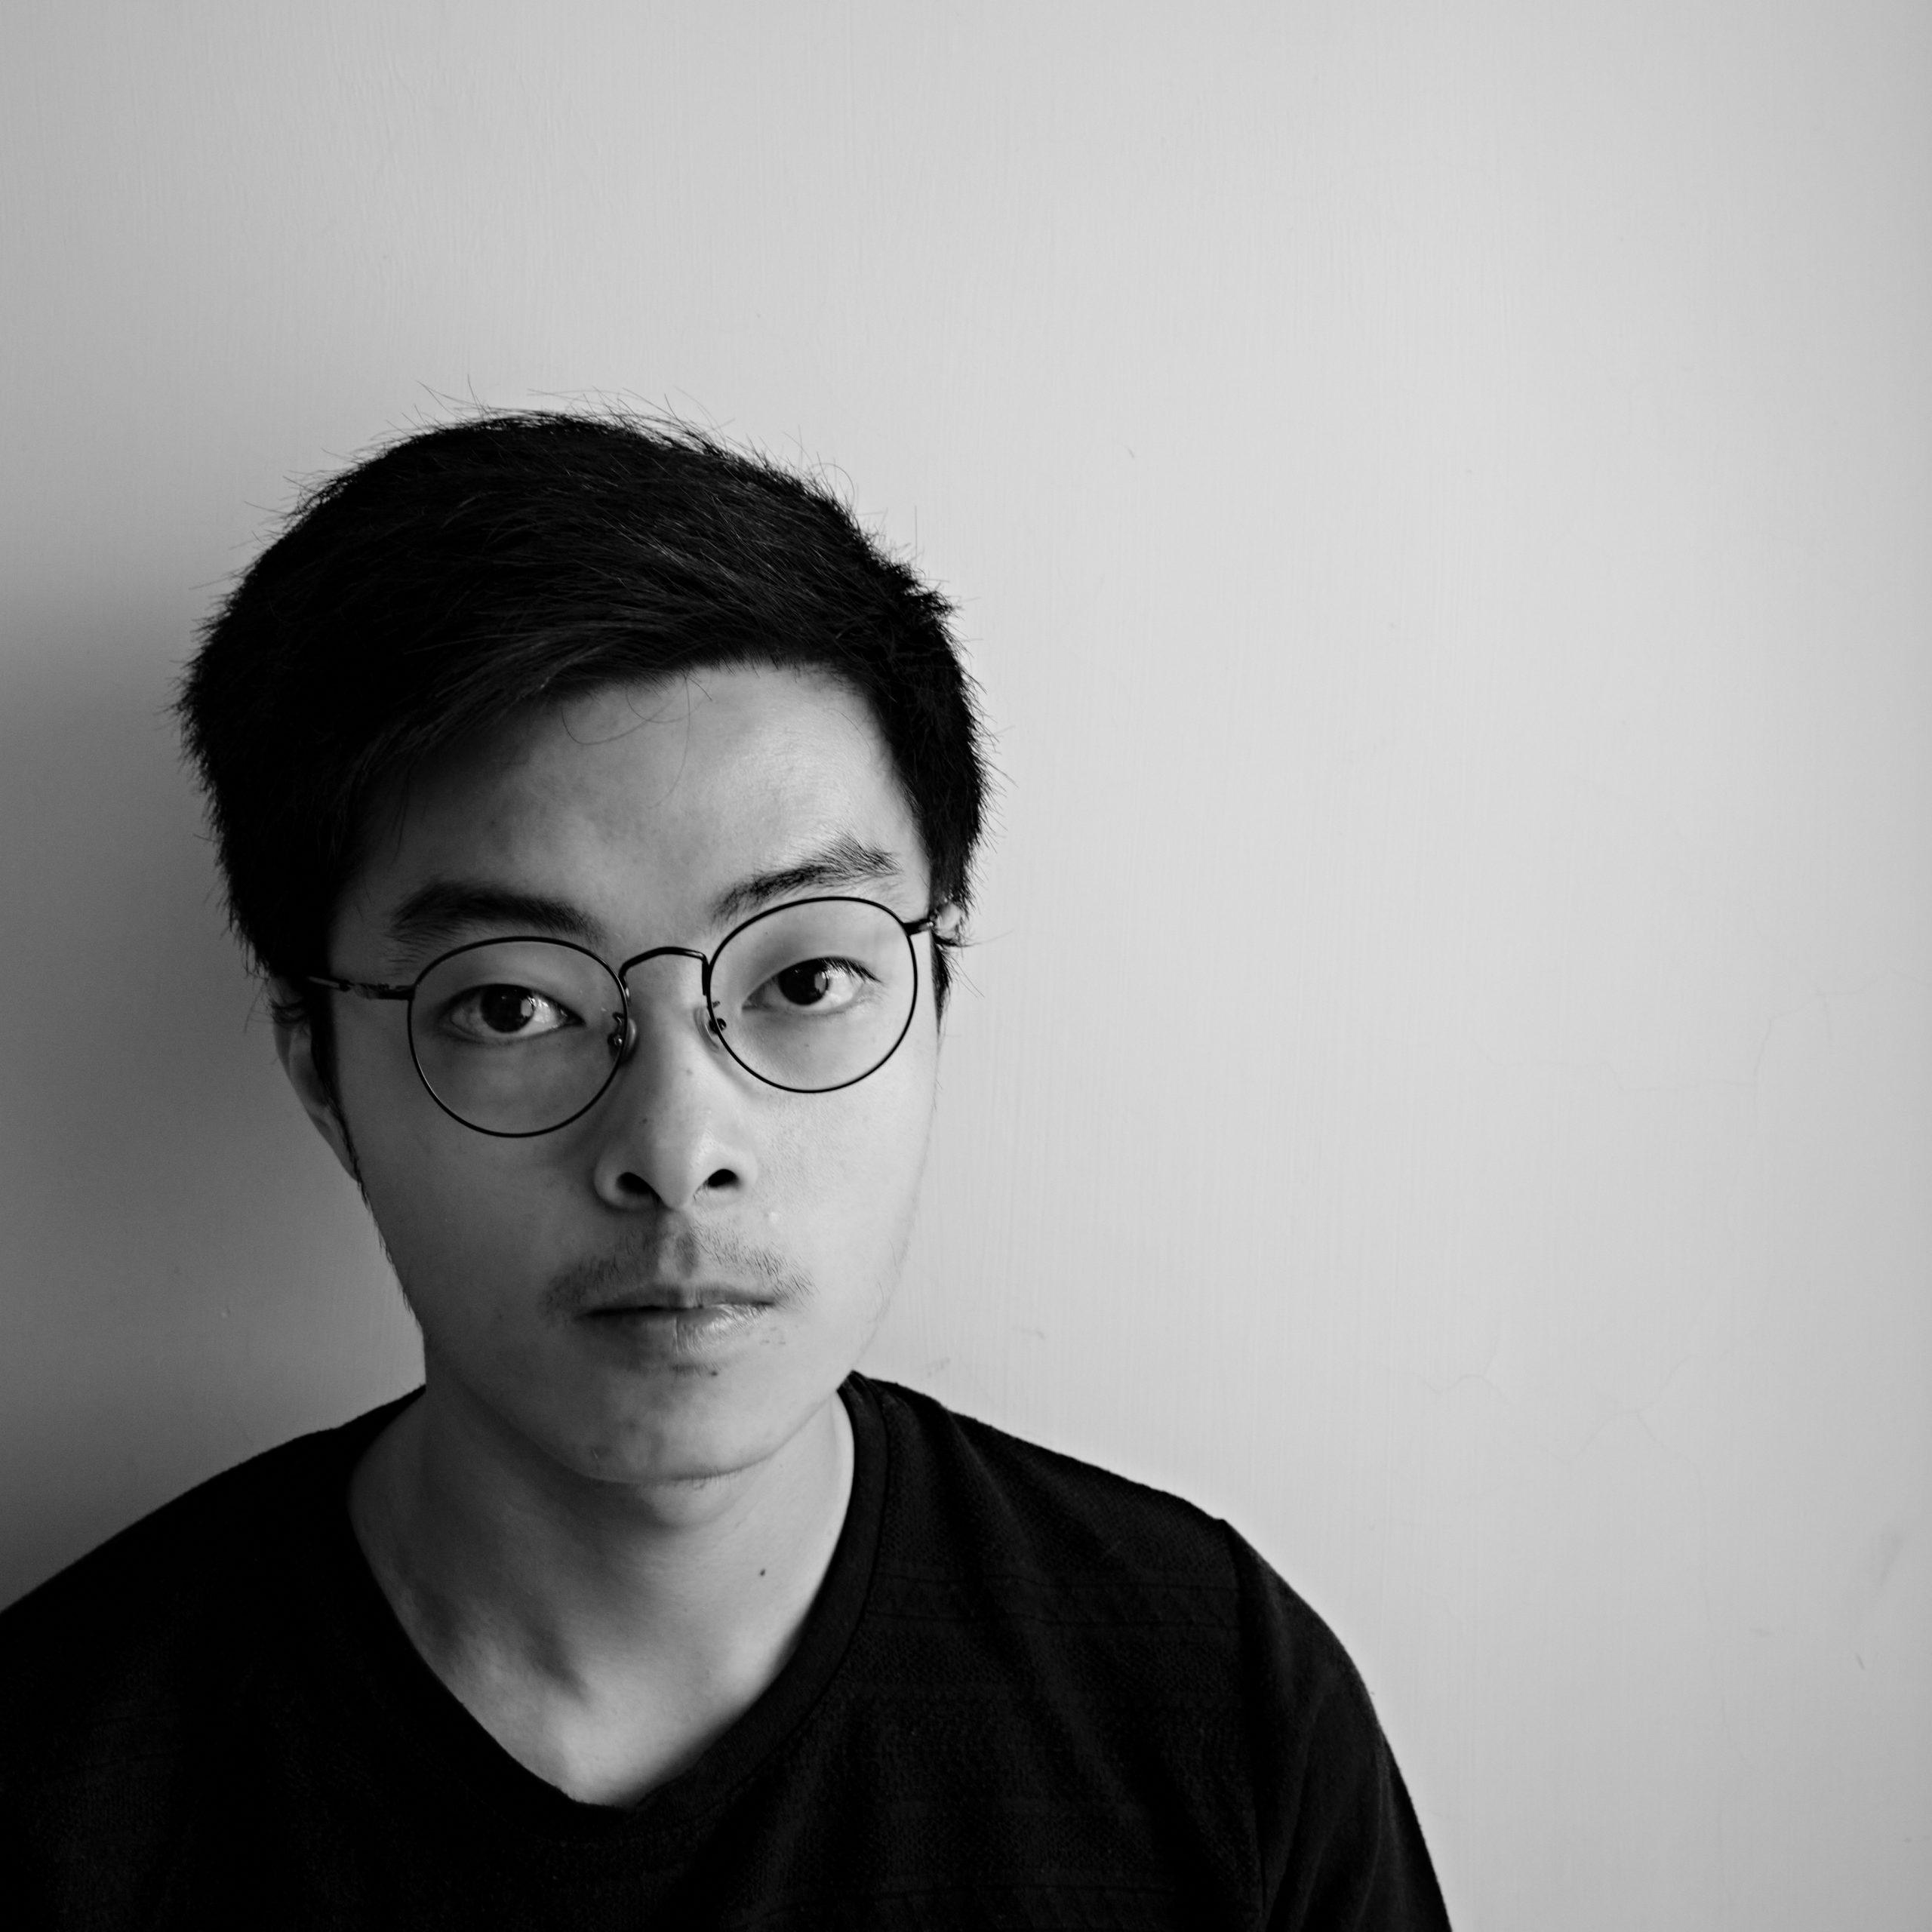 Isaac Wong – Photog Bio